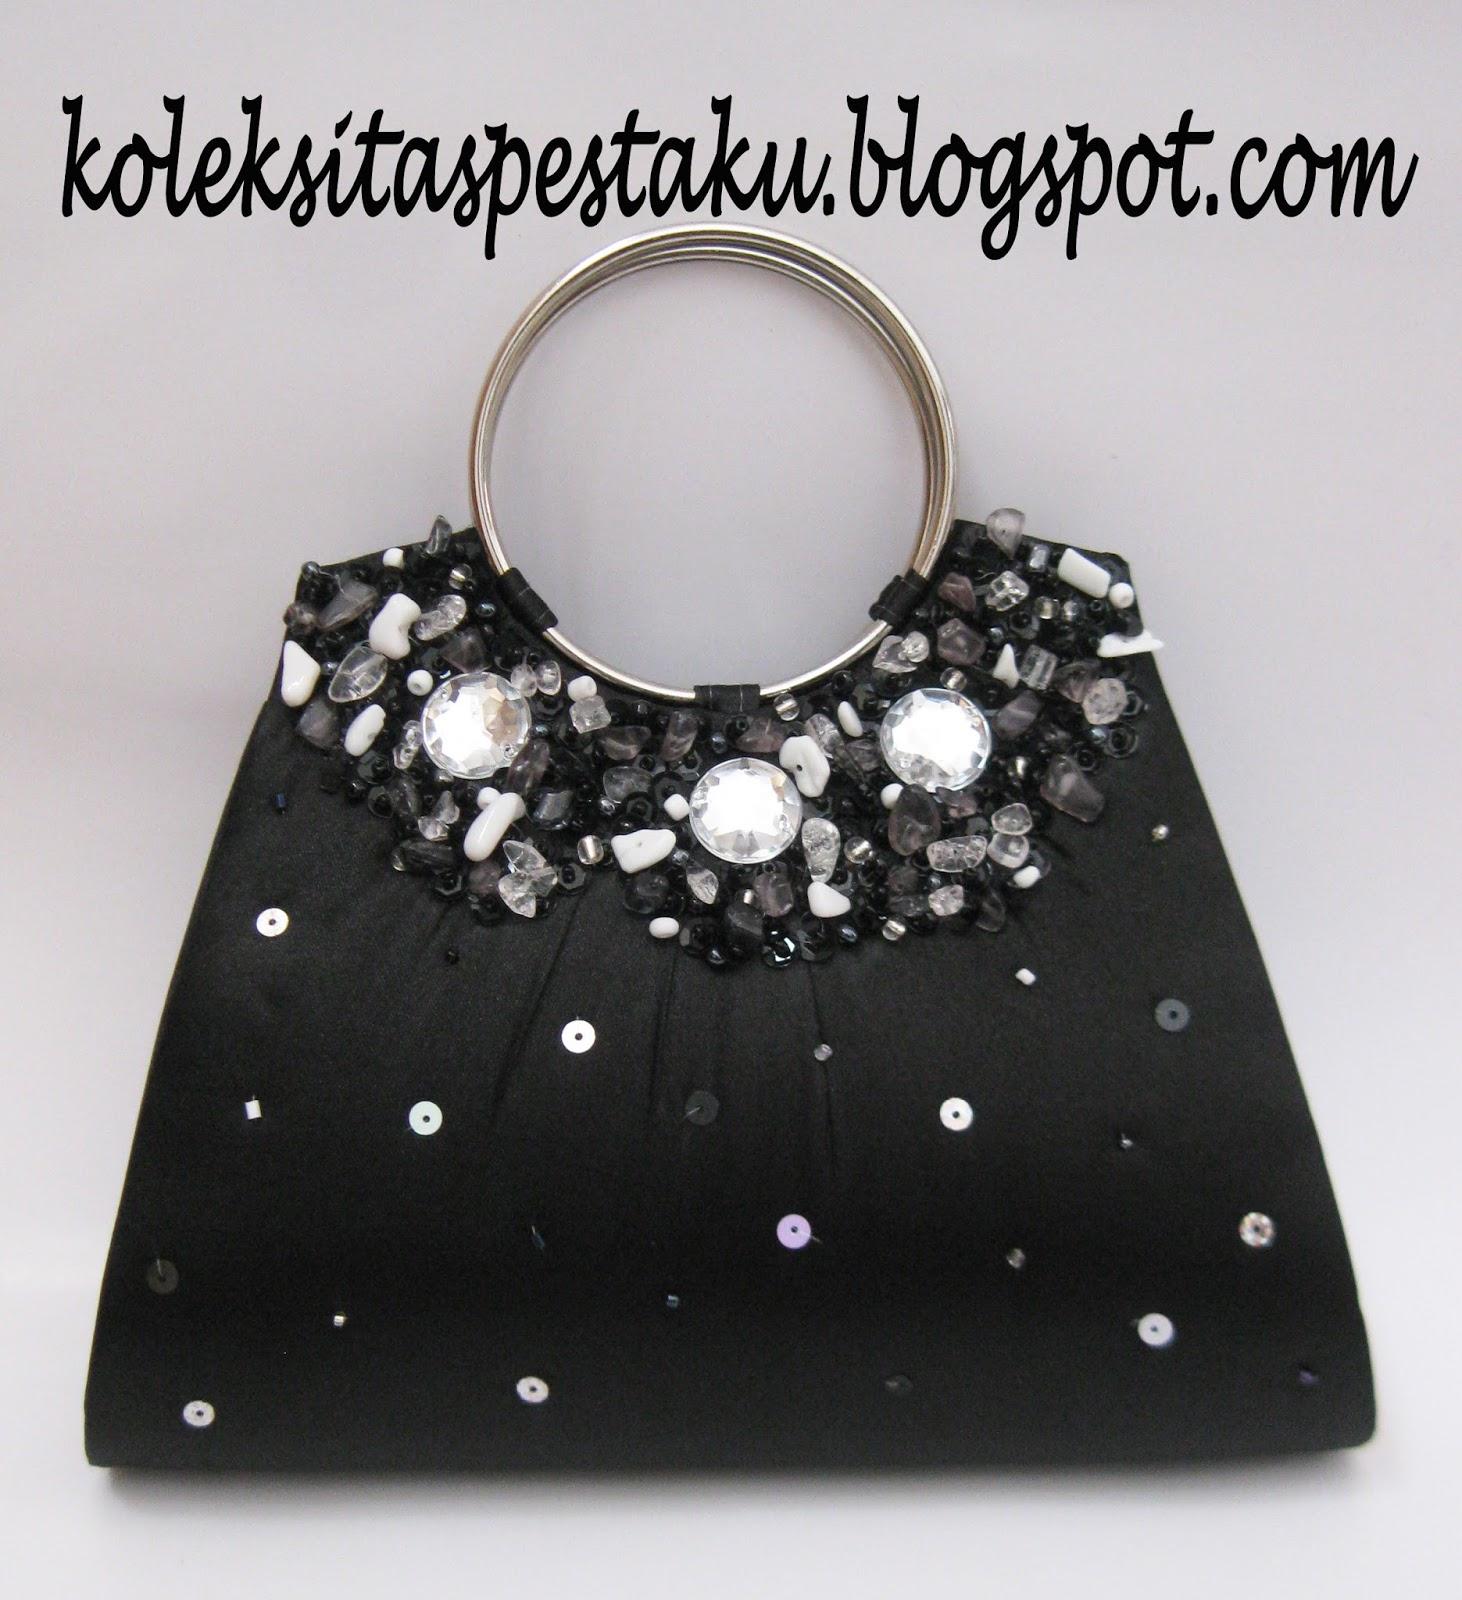 Tas Pesta Dompet Model Terbaru Mewah Elegant Warna Hitam. TAS PESTA - CLUTCH  BAG ... 31af73d642